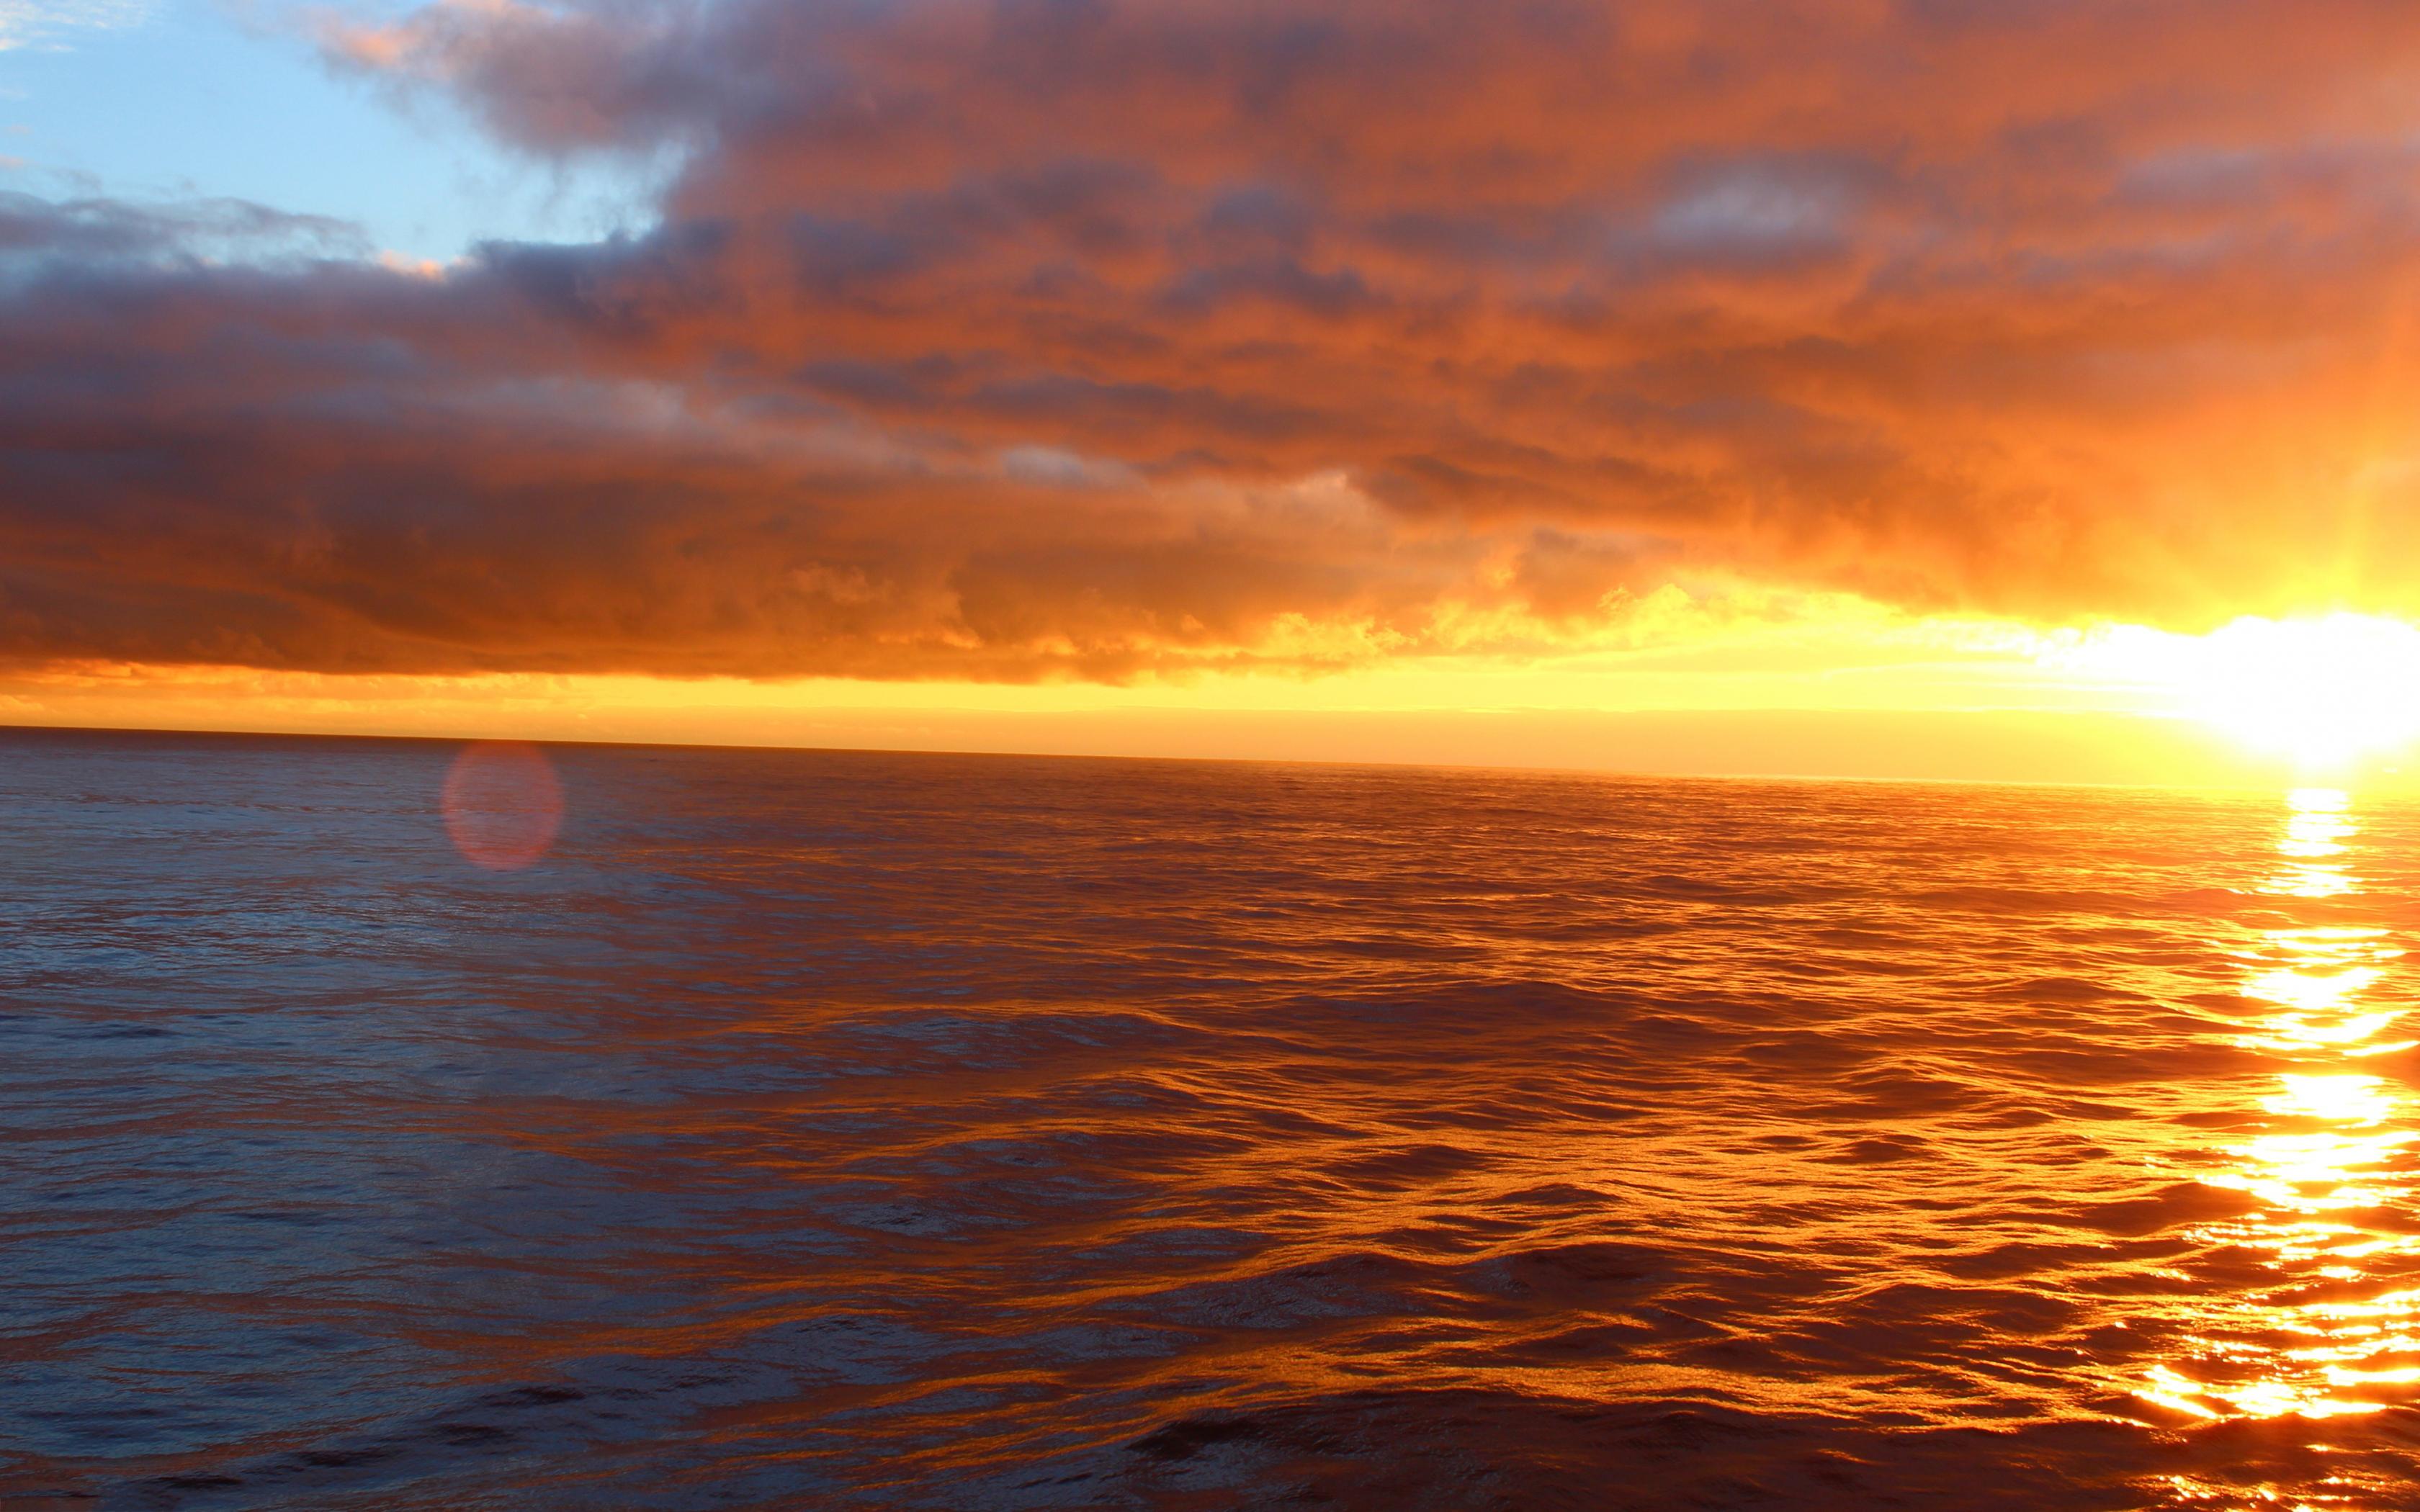 sunset photos ocean